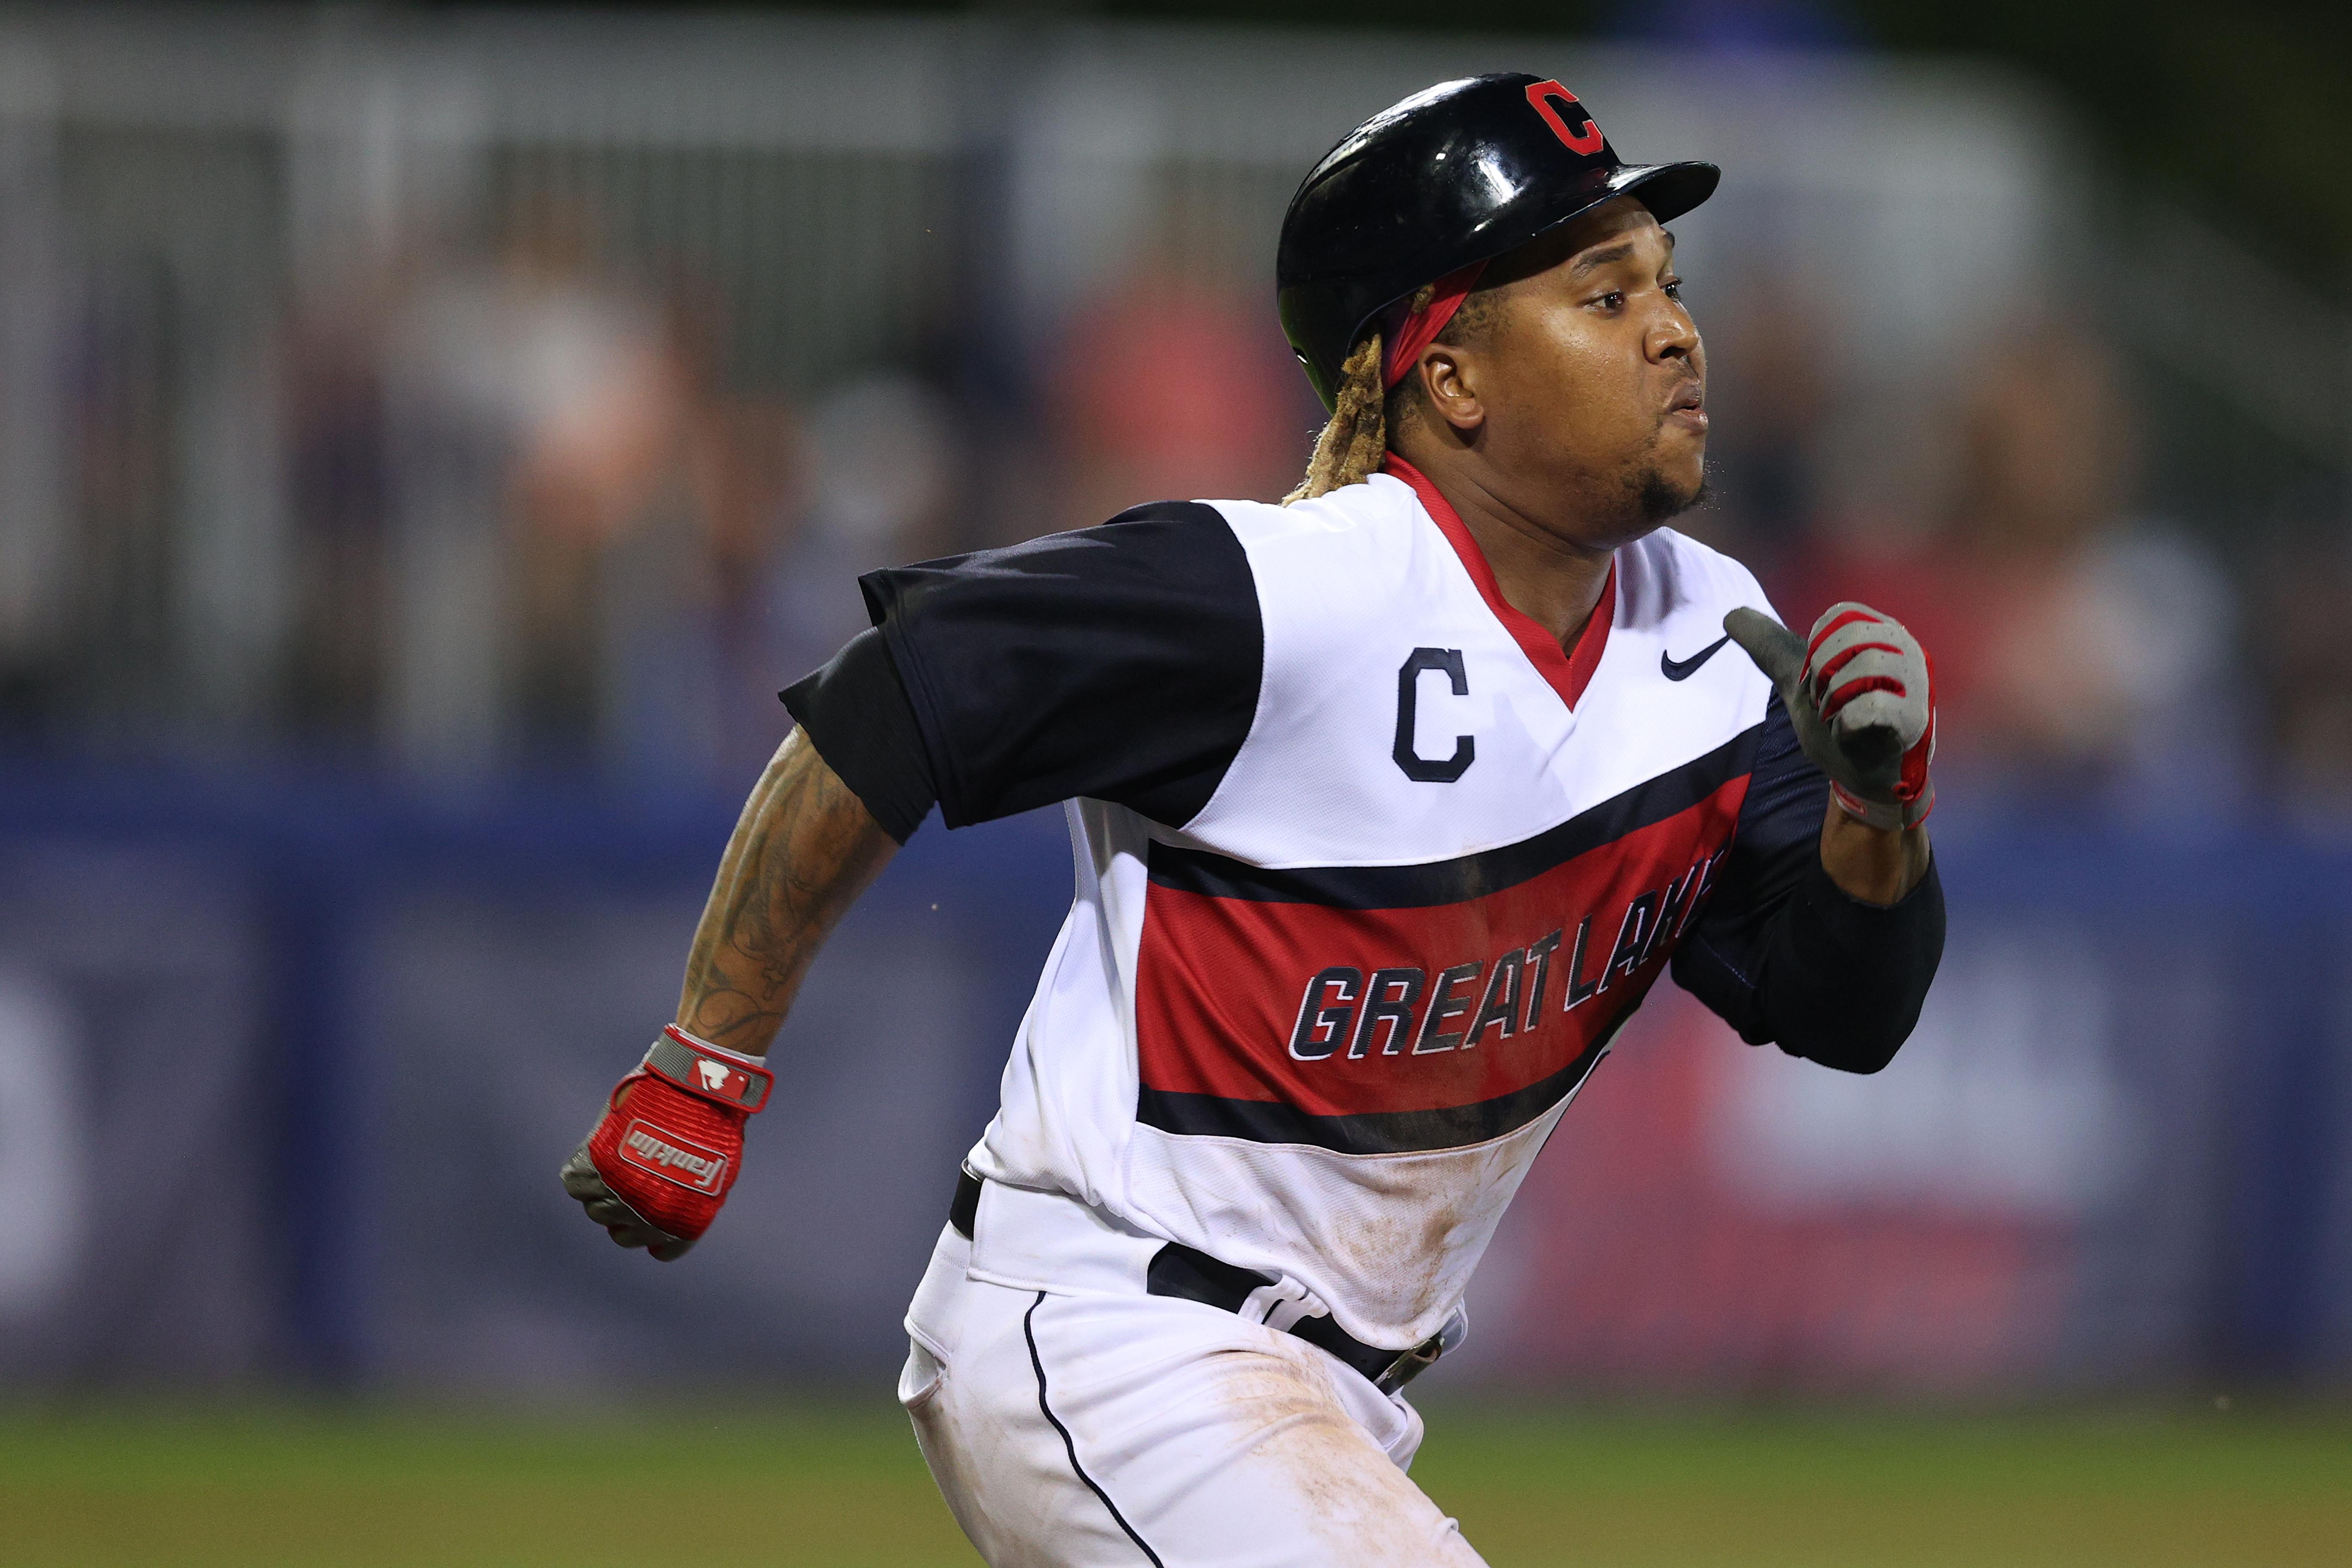 2021 Little League Classic: Los Angeles Angels v Cleveland Indians